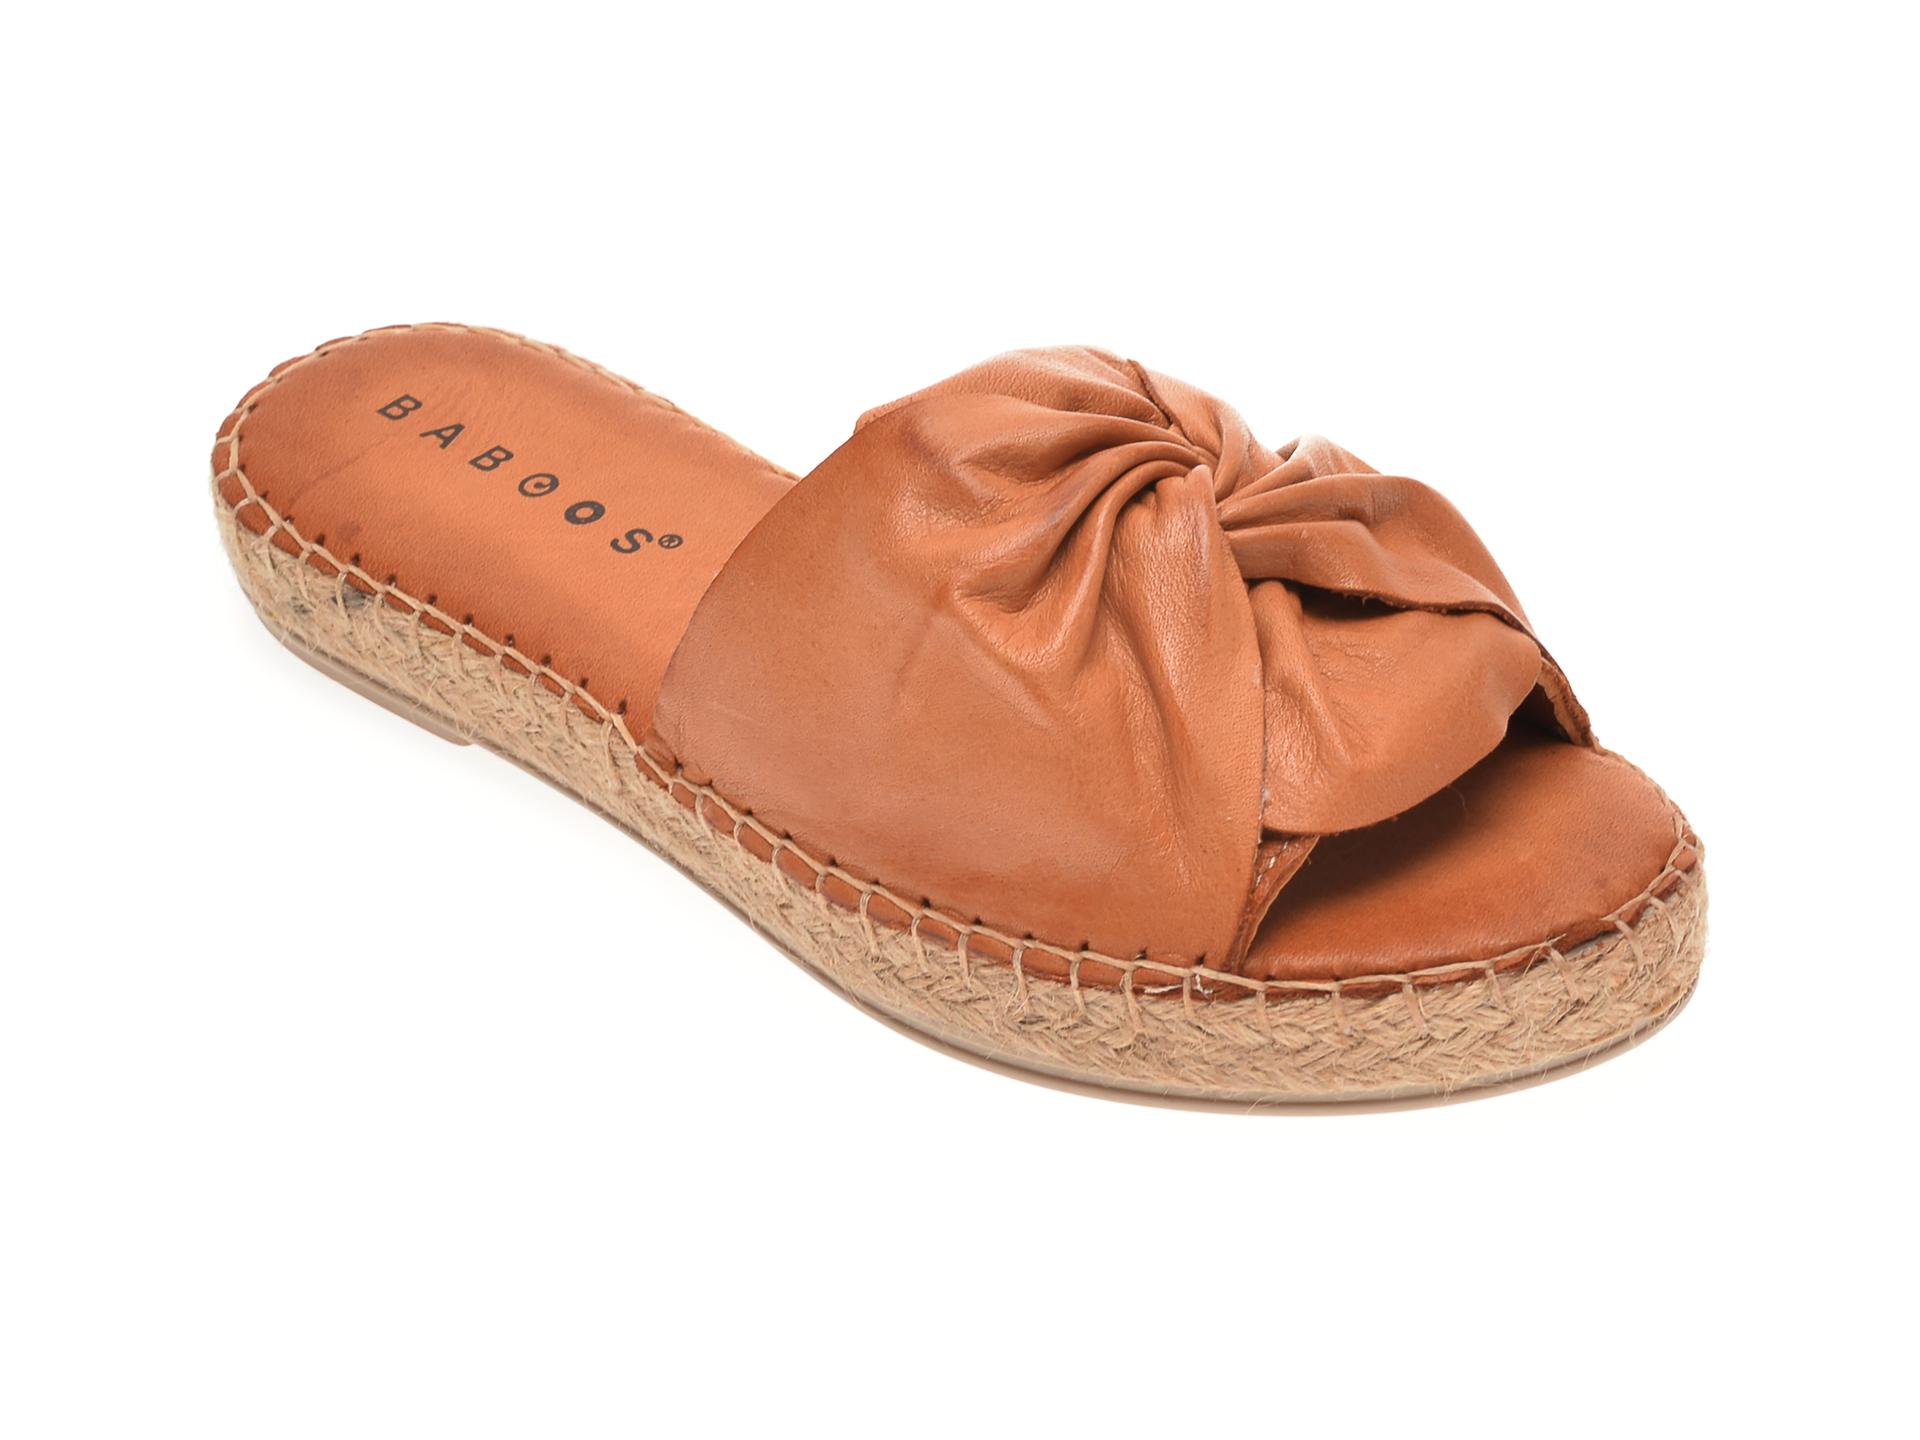 Papuci BABOOS maro, R08, din piele naturala